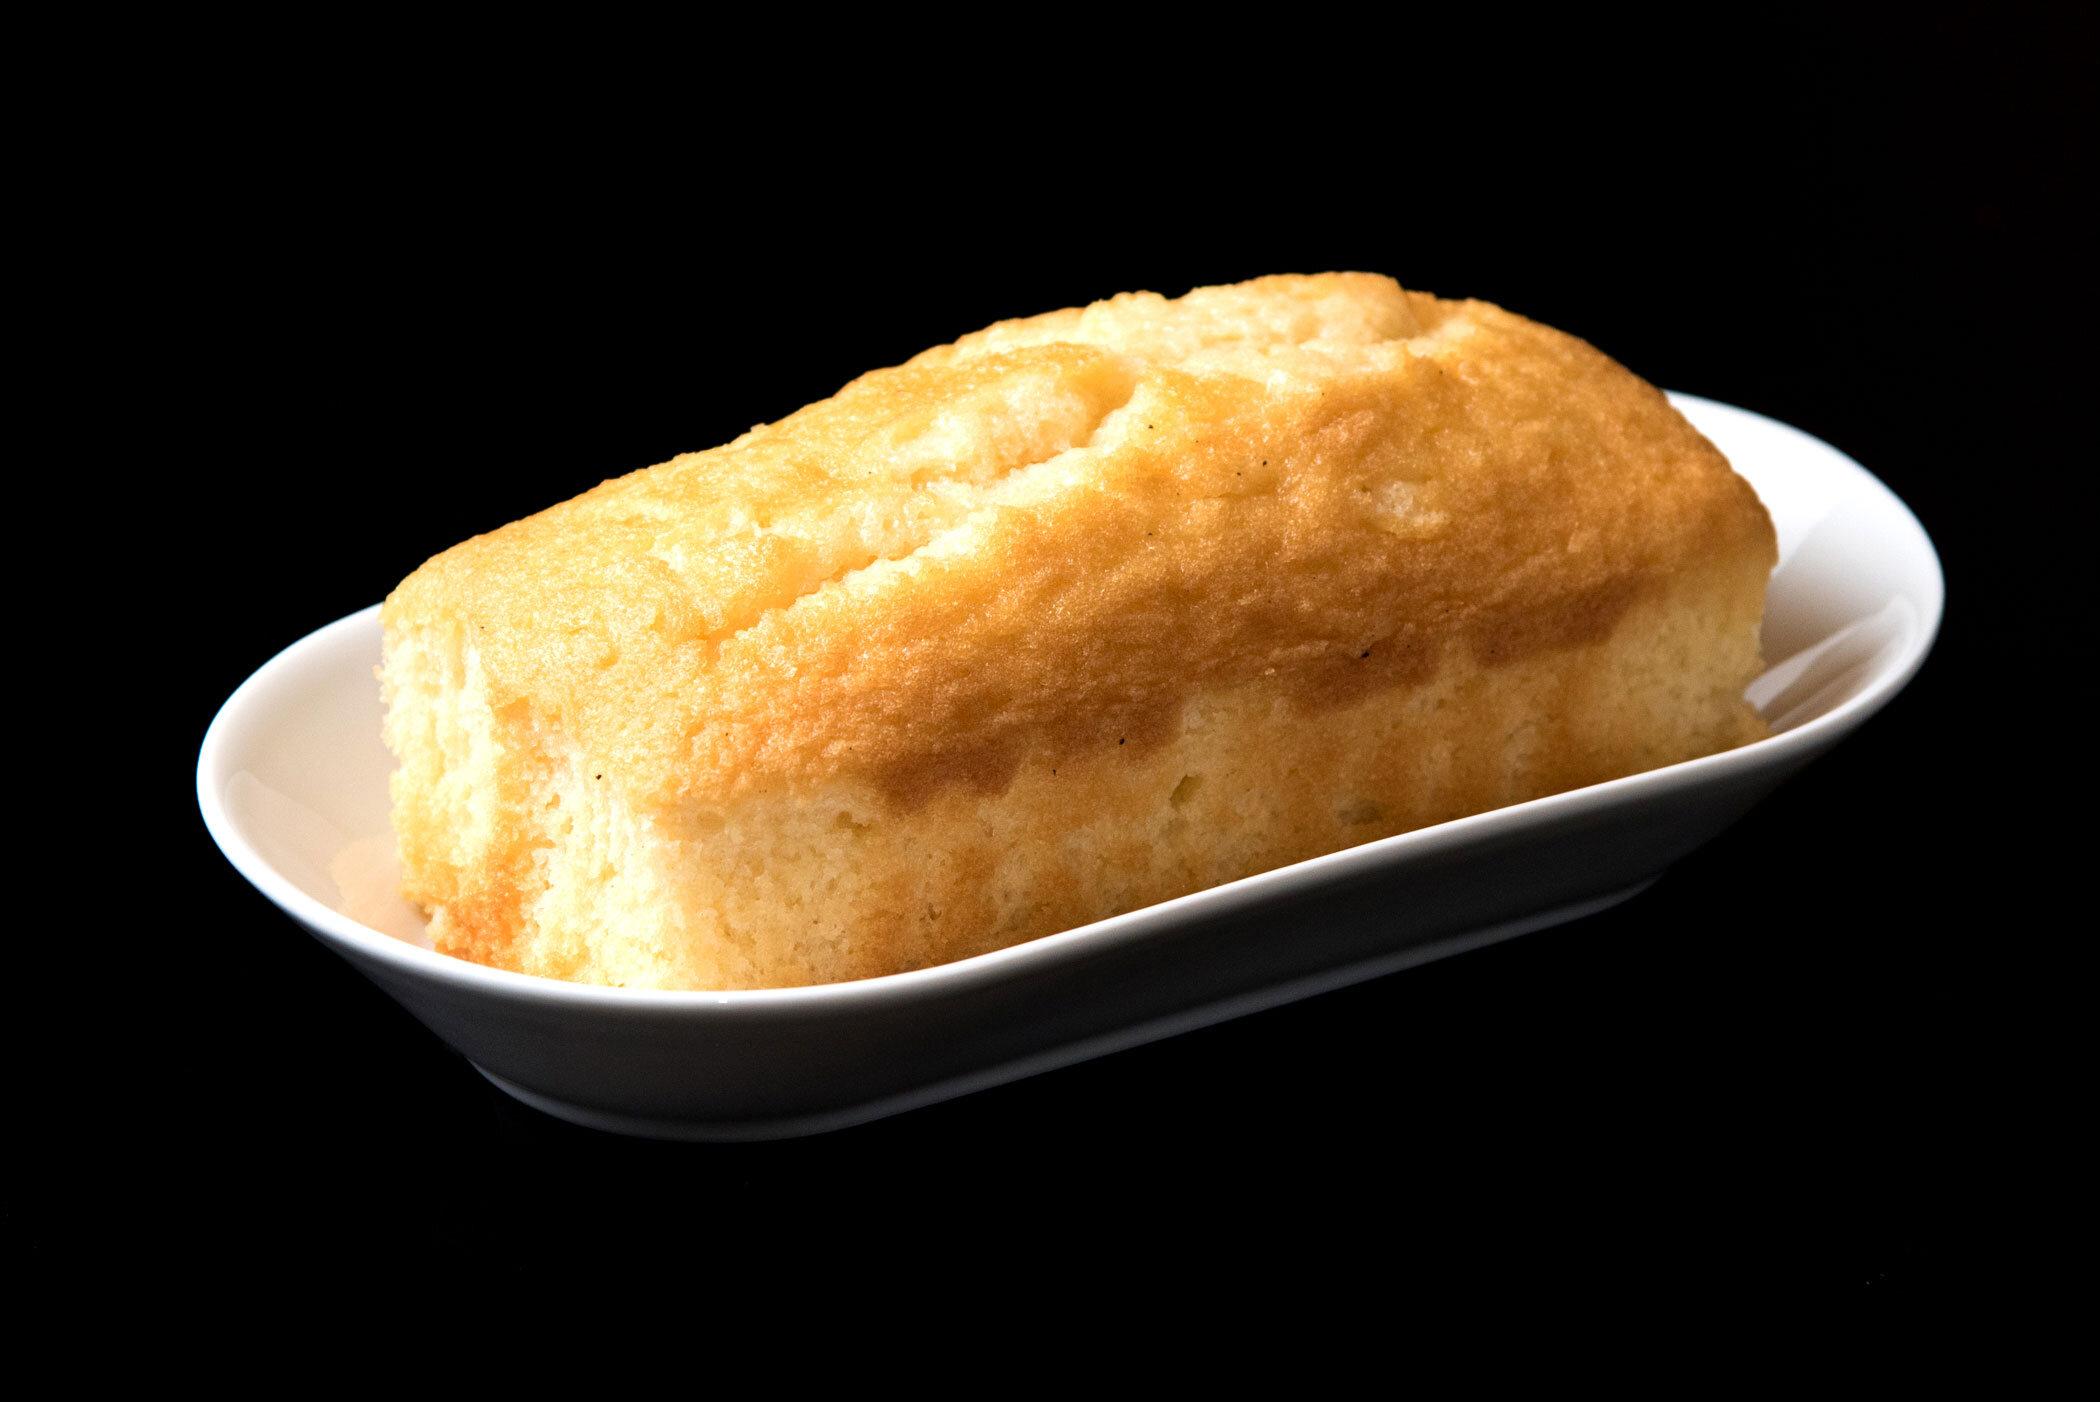 """Cake, cake-cake, cake-cake, 500 million, I got a pound cake"" - JAY Z, ""Pound Cake"""